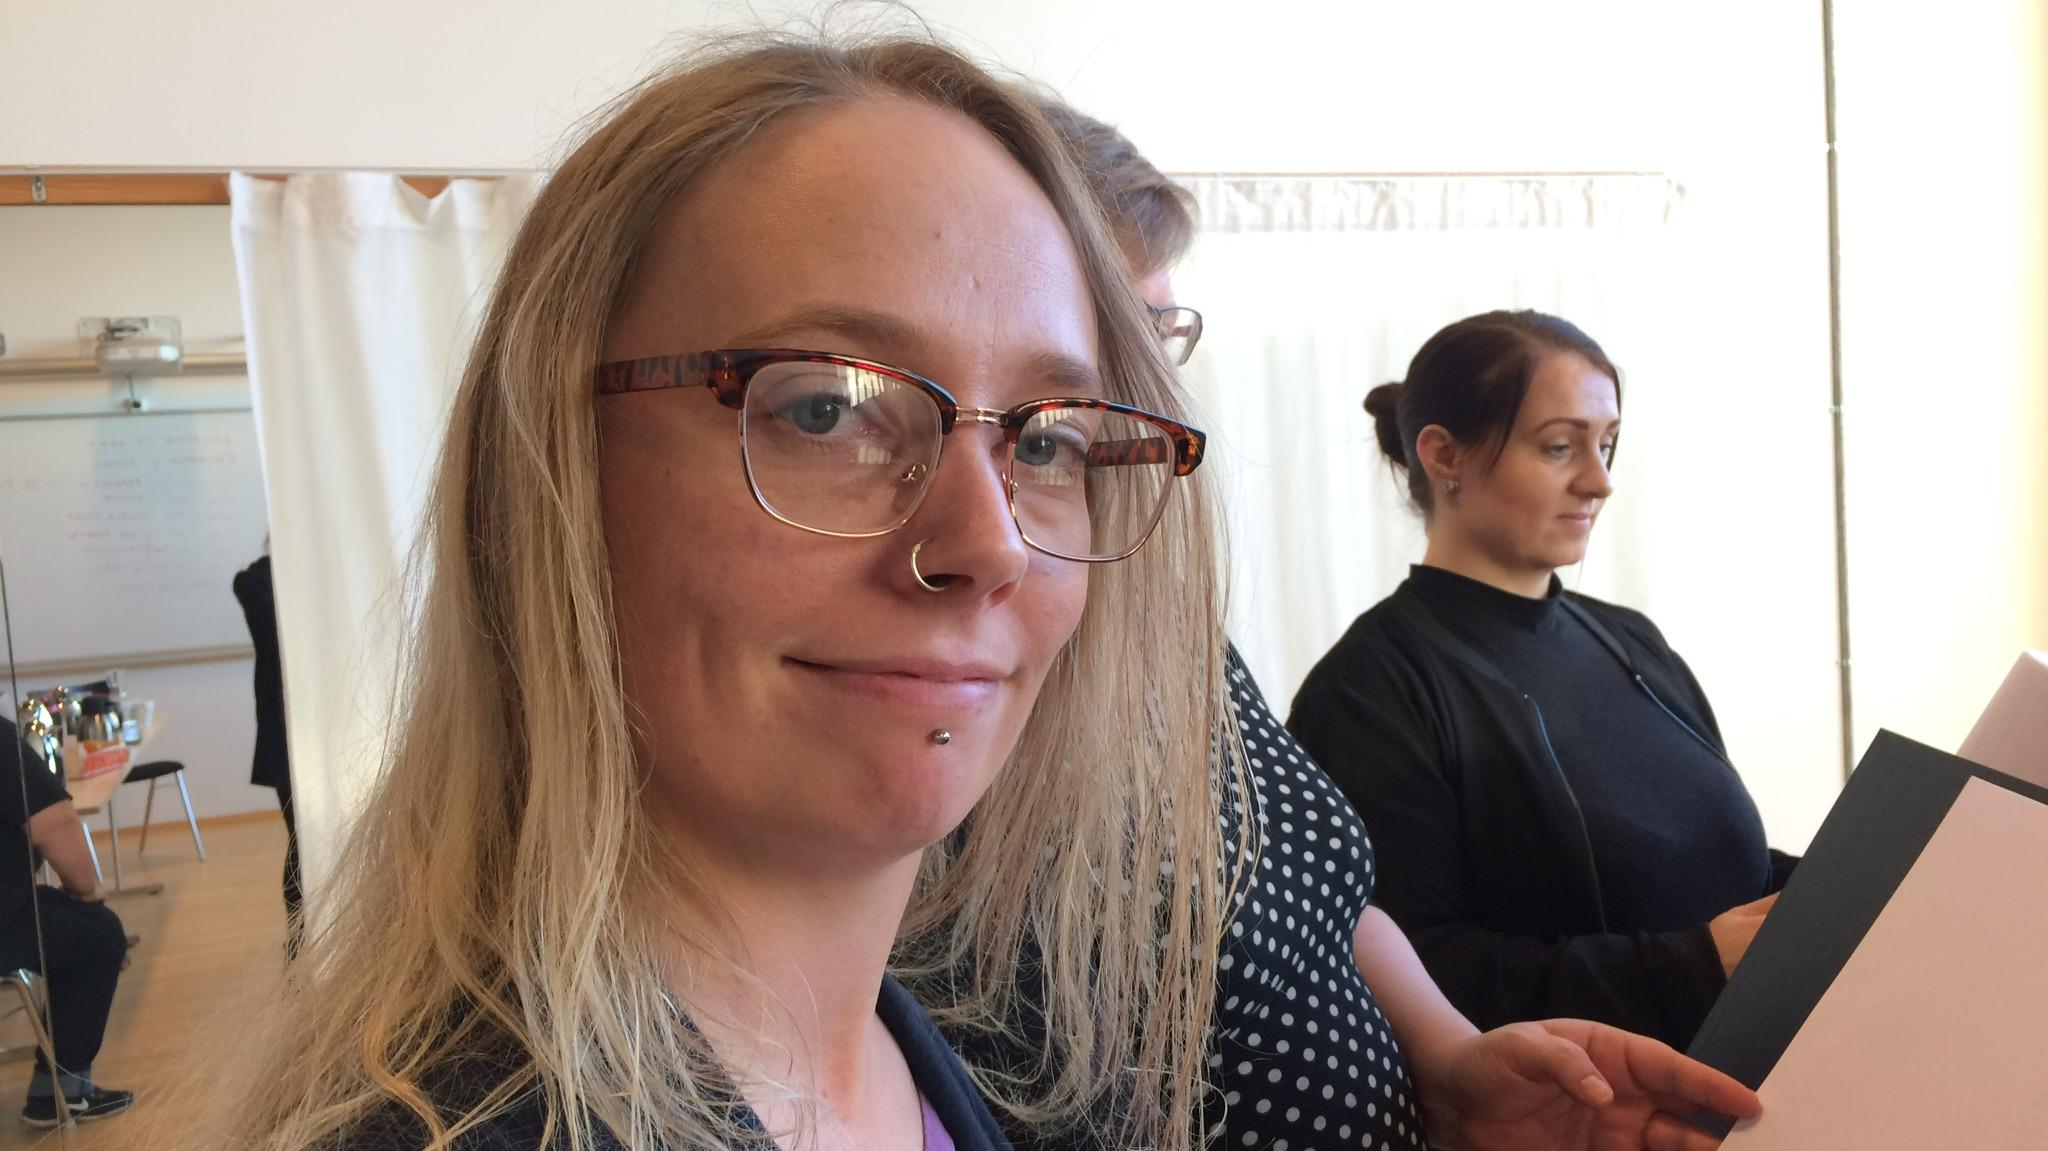 Linda Kristensen, langtidssygemeldt